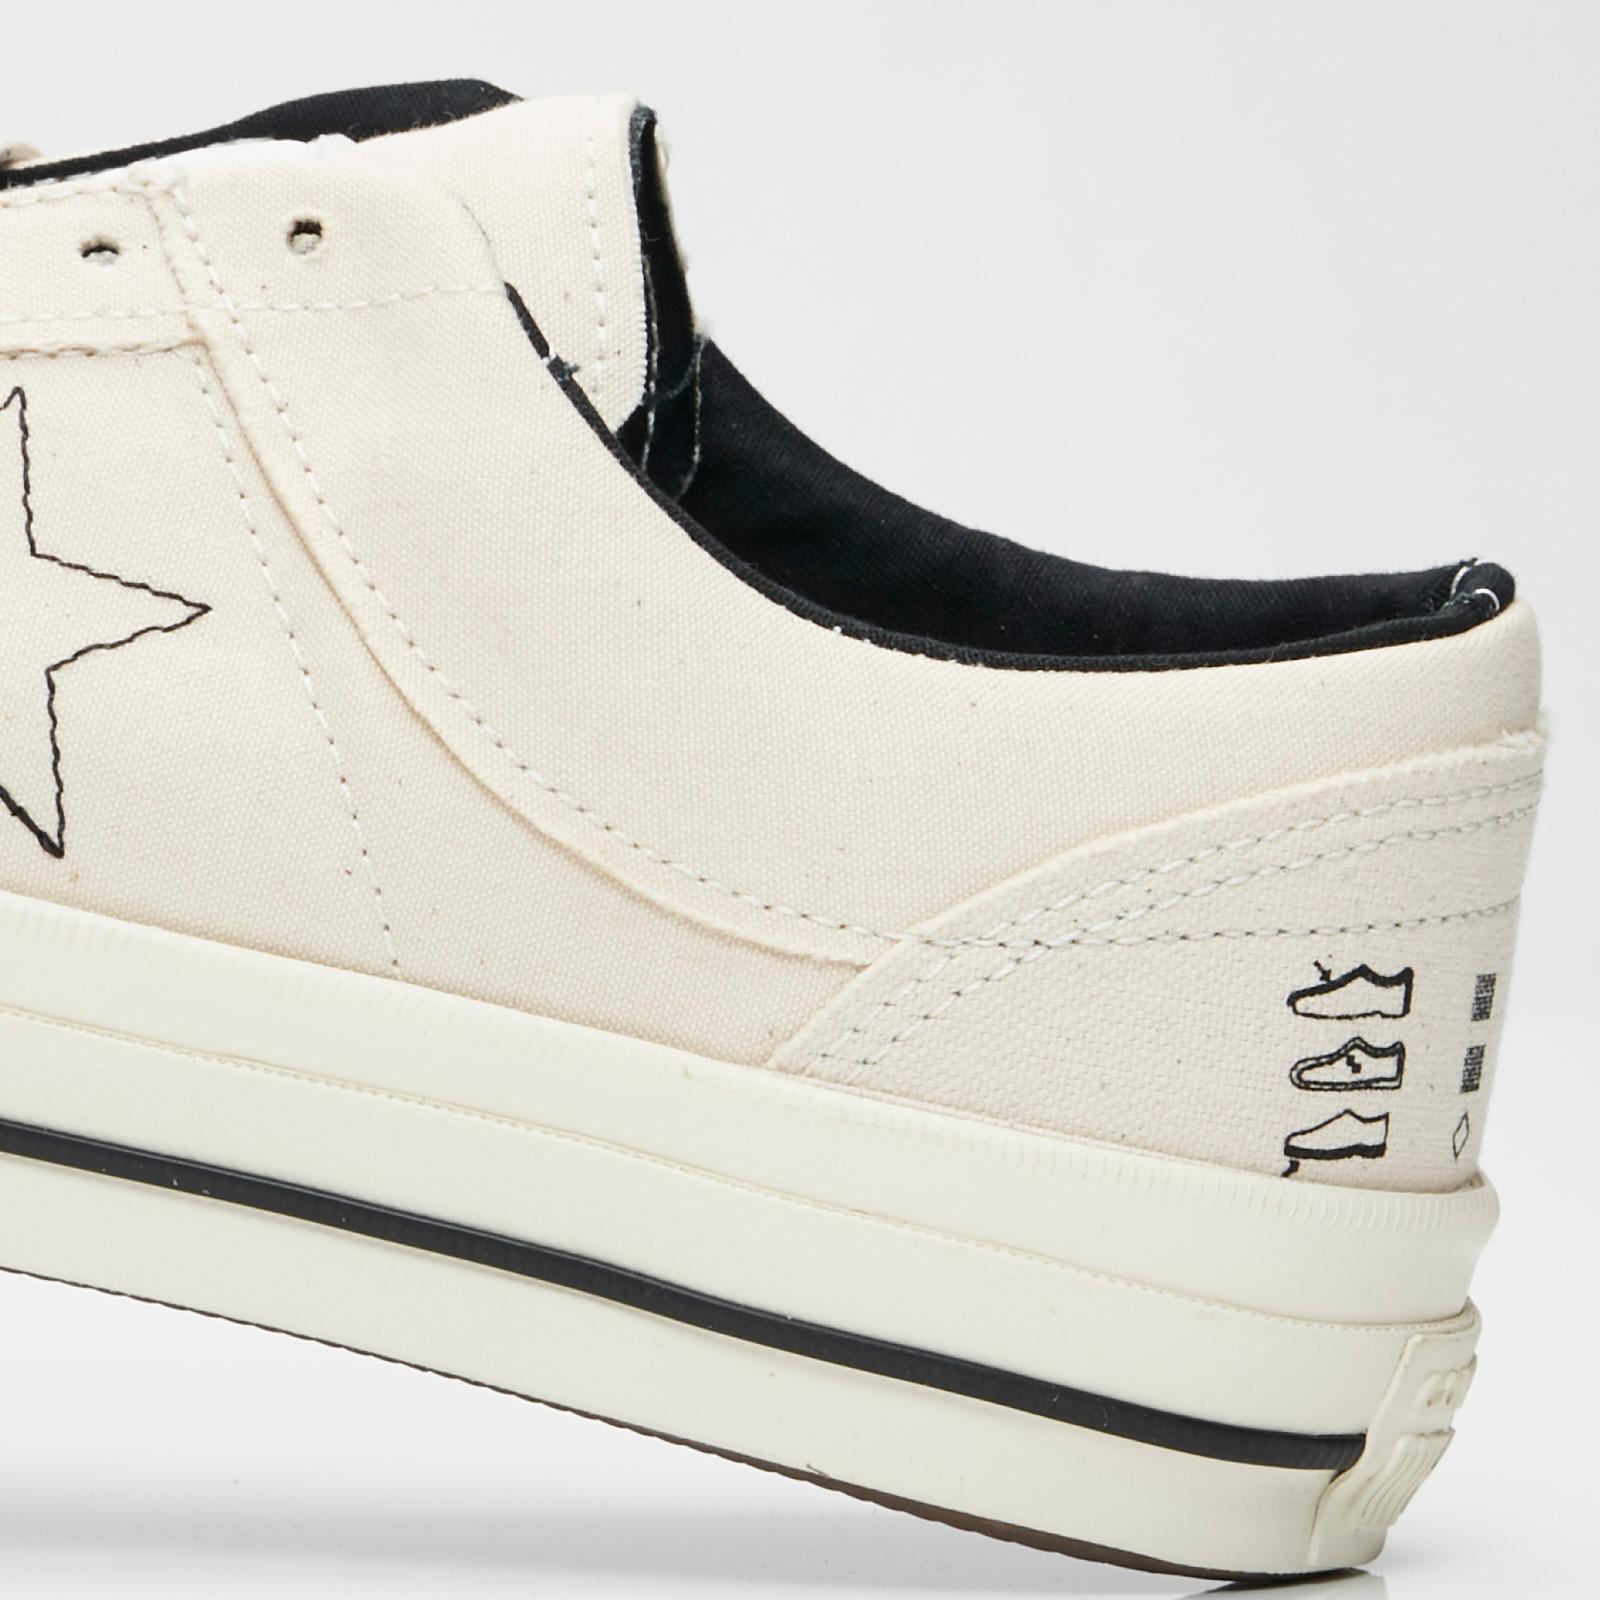 24c9d208e17529 Converse One Star x Midnight Studio - 162124c - Sneakersnstuff ...